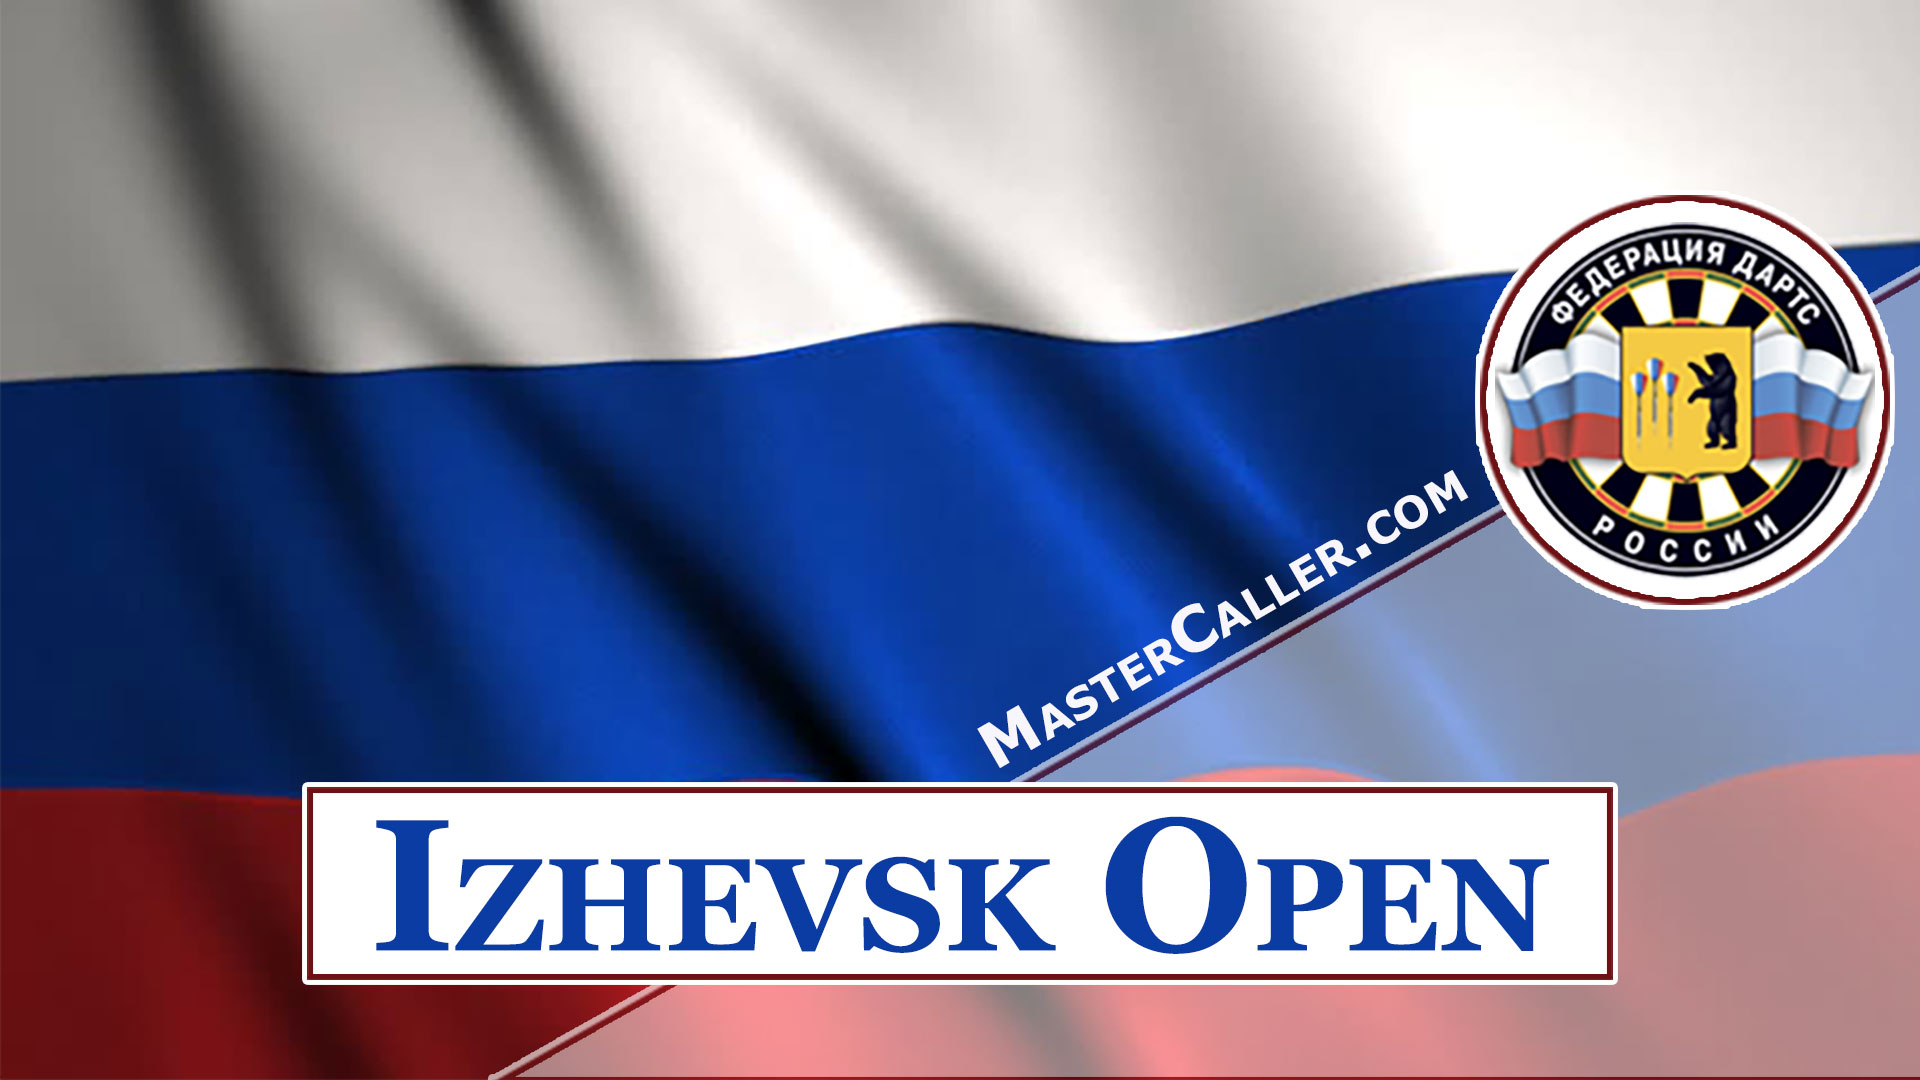 Izhevsk Open Girls - 2021 Logo